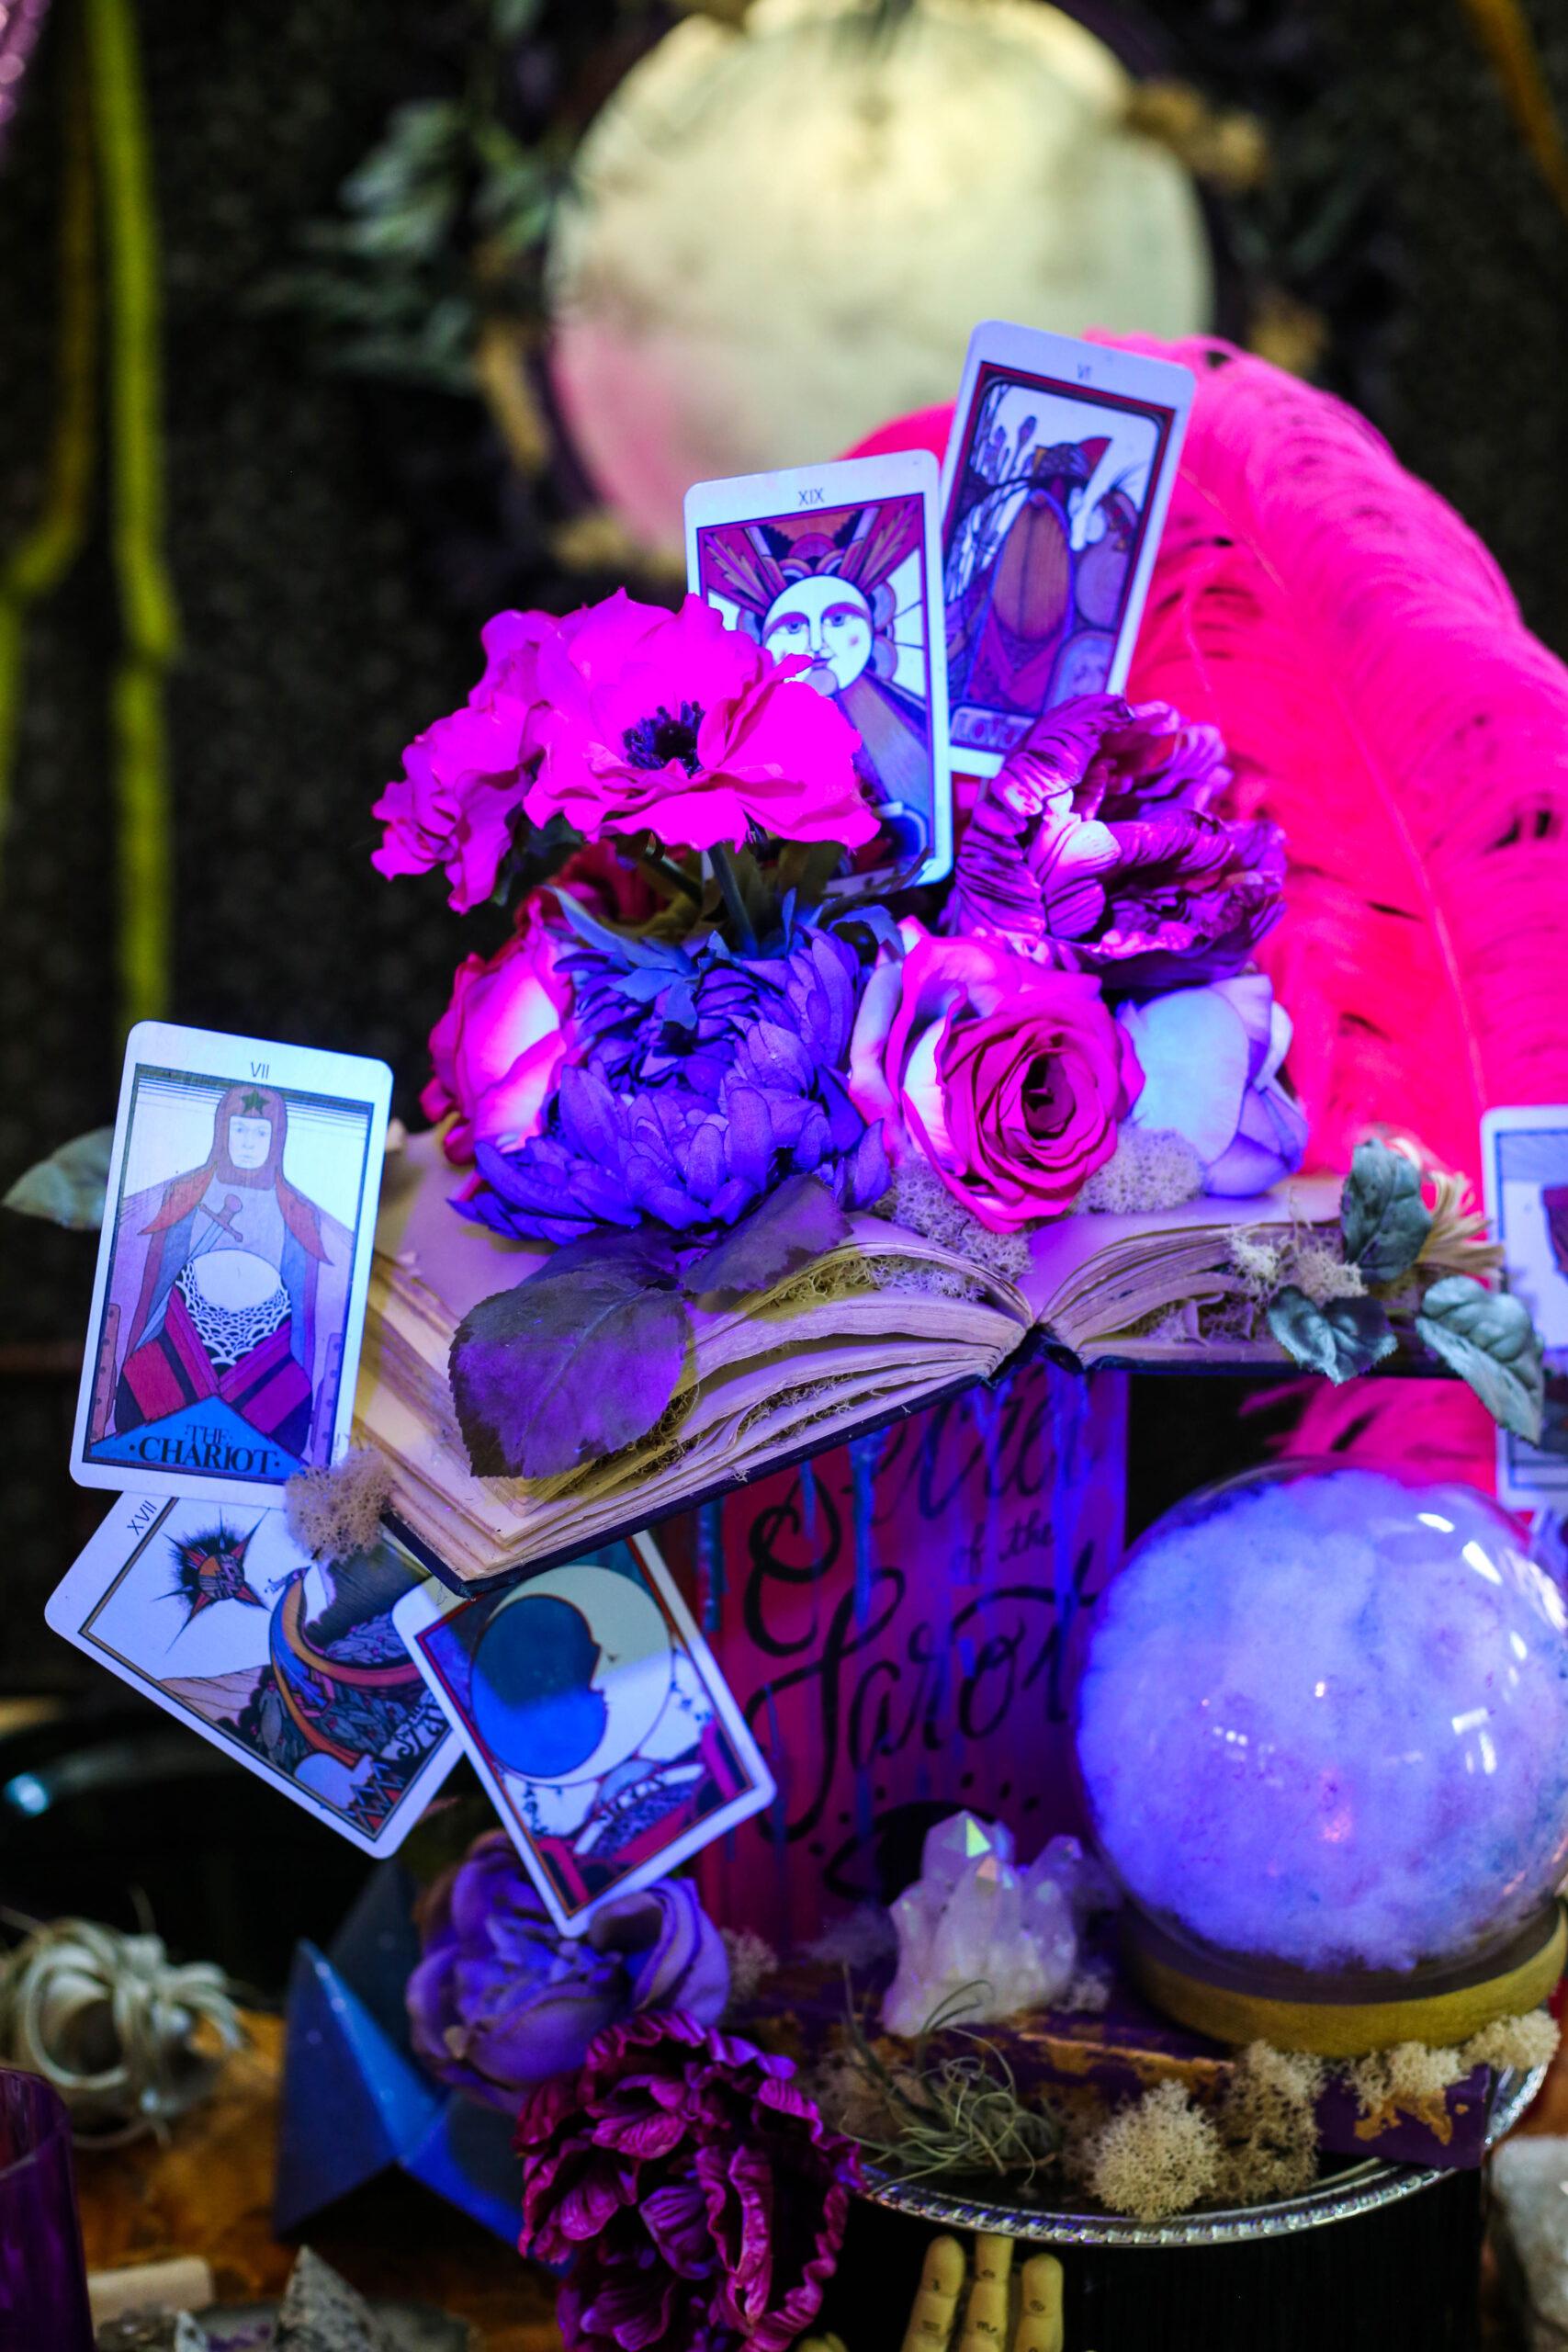 mod podge black light effects on diy fortune teller party decorations